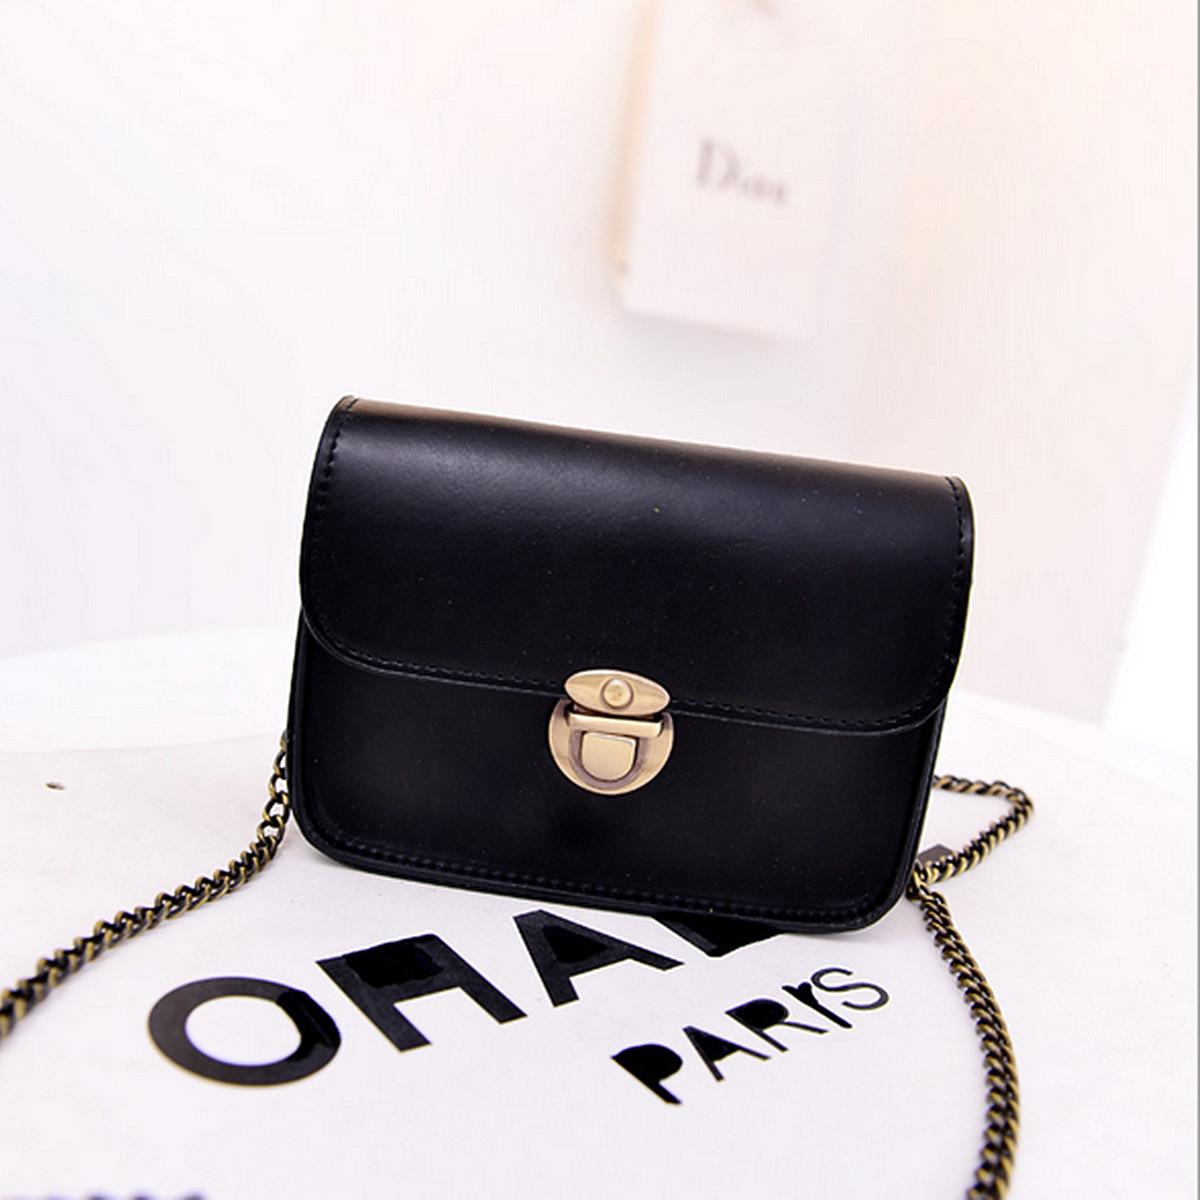 Women Lady Leather Chain Shoulder Bag Messenger Crossbody Satchel Handbag Purse